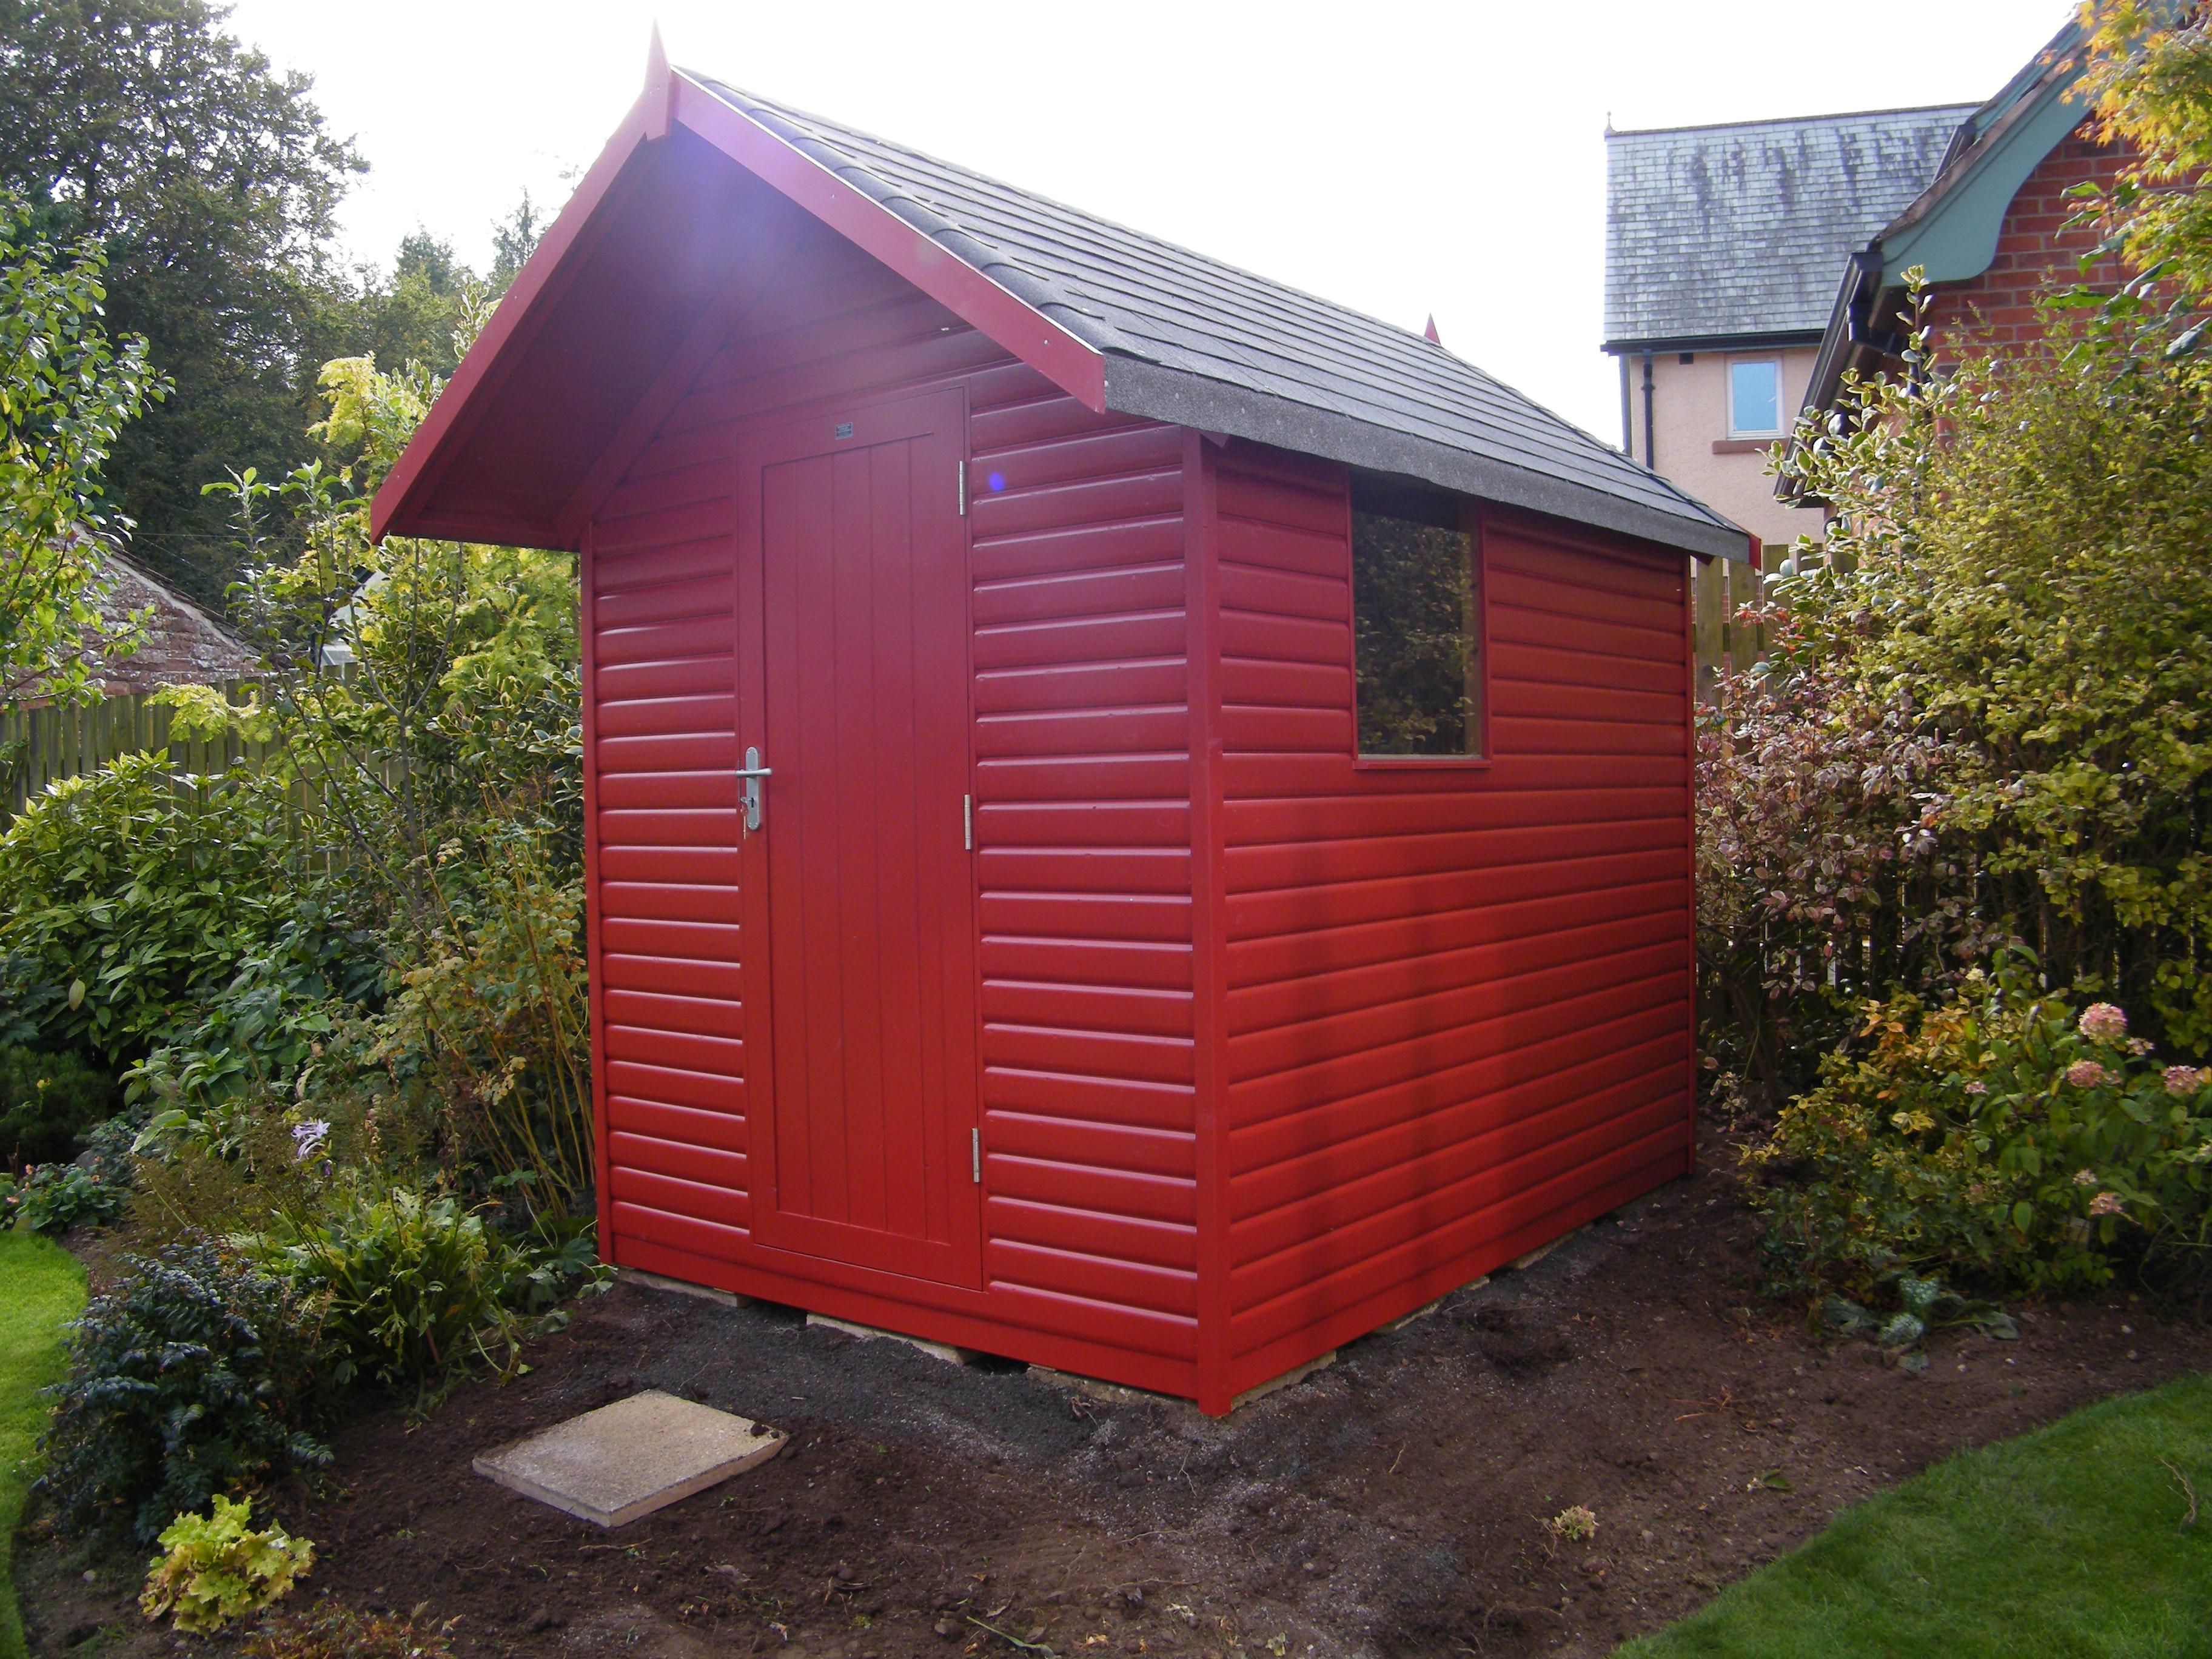 Morton garden buildings ltd cumbria gazebos garden for Quality garden sheds